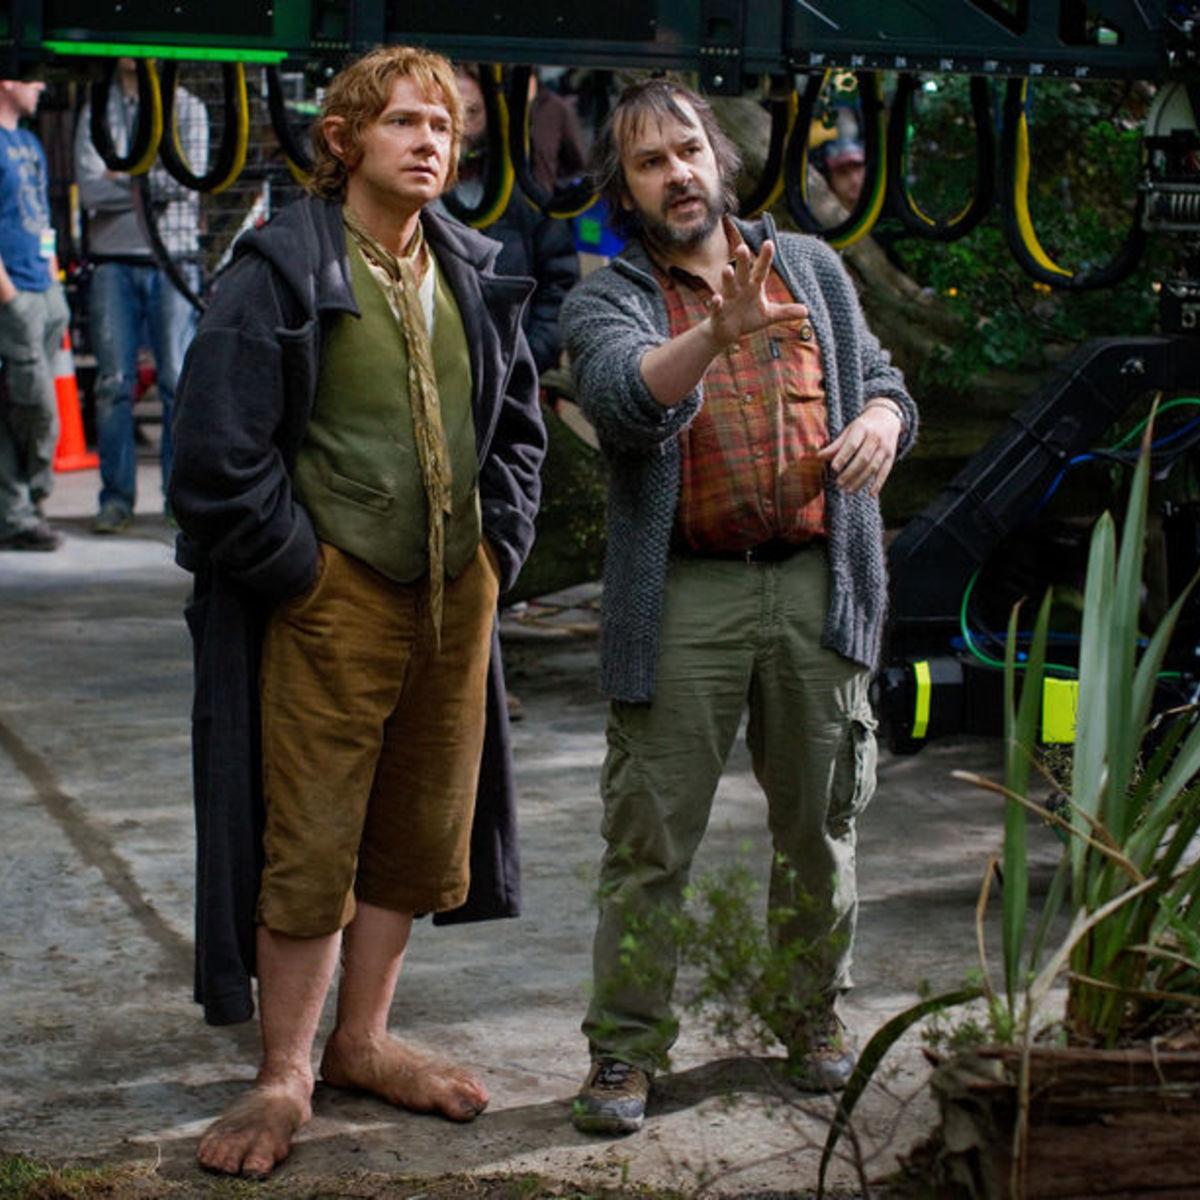 hobbit-peter-jackson.jpg